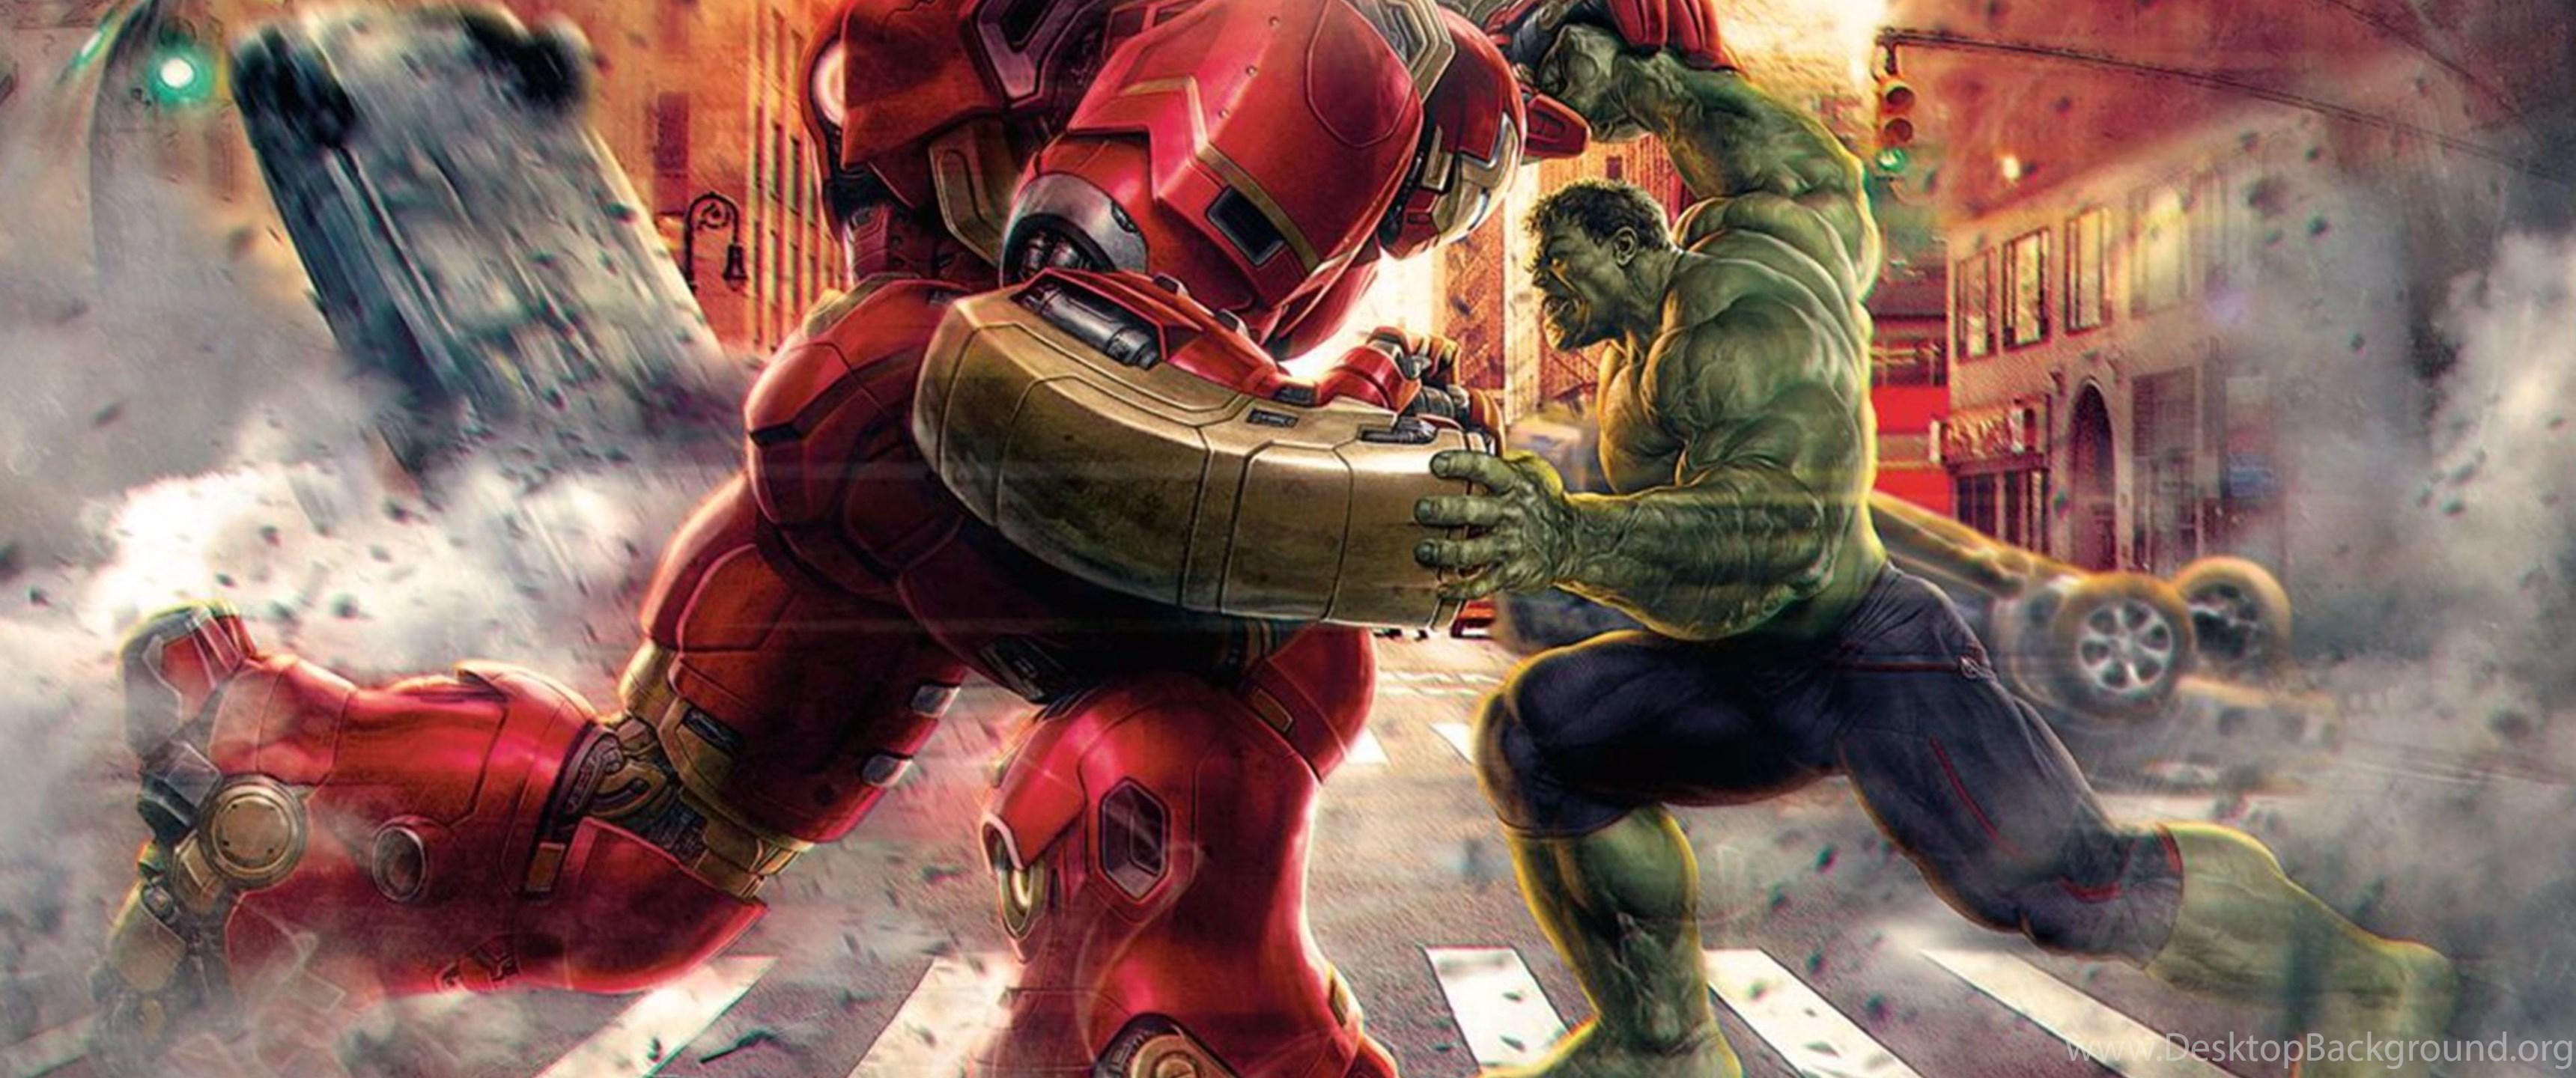 Top 2016 Avengers Age Of Ultron 4K Wallpapers Desktop ...